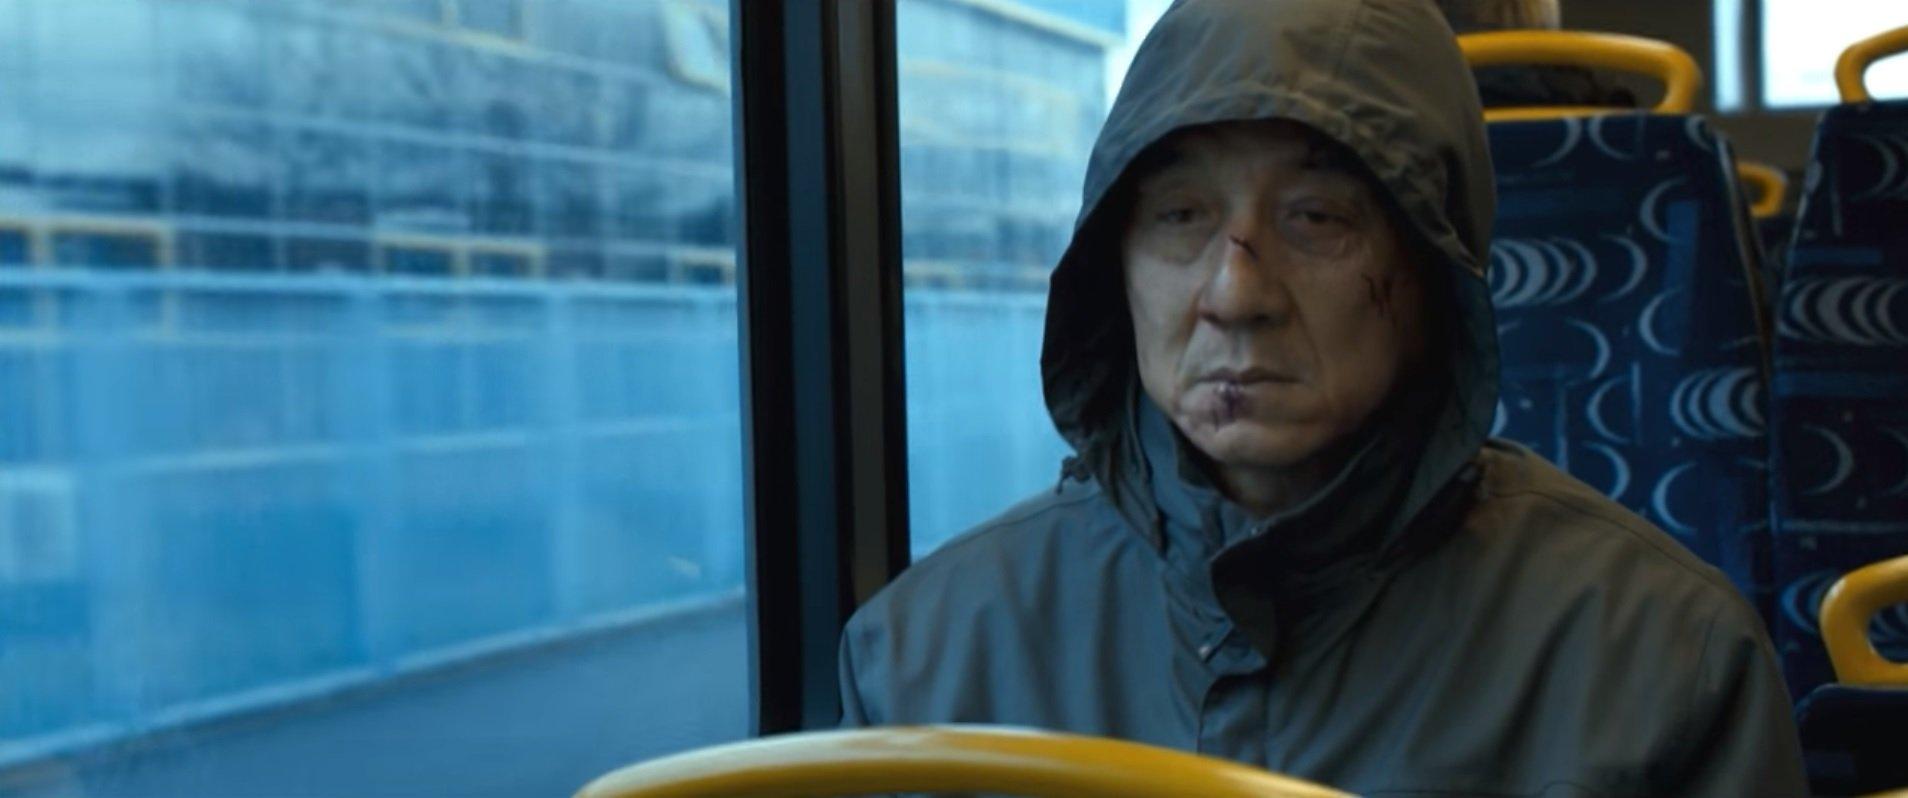 Jackie Chan kontra Pierce Brosnan. Świetny zwiastun thrillera The Foreigner